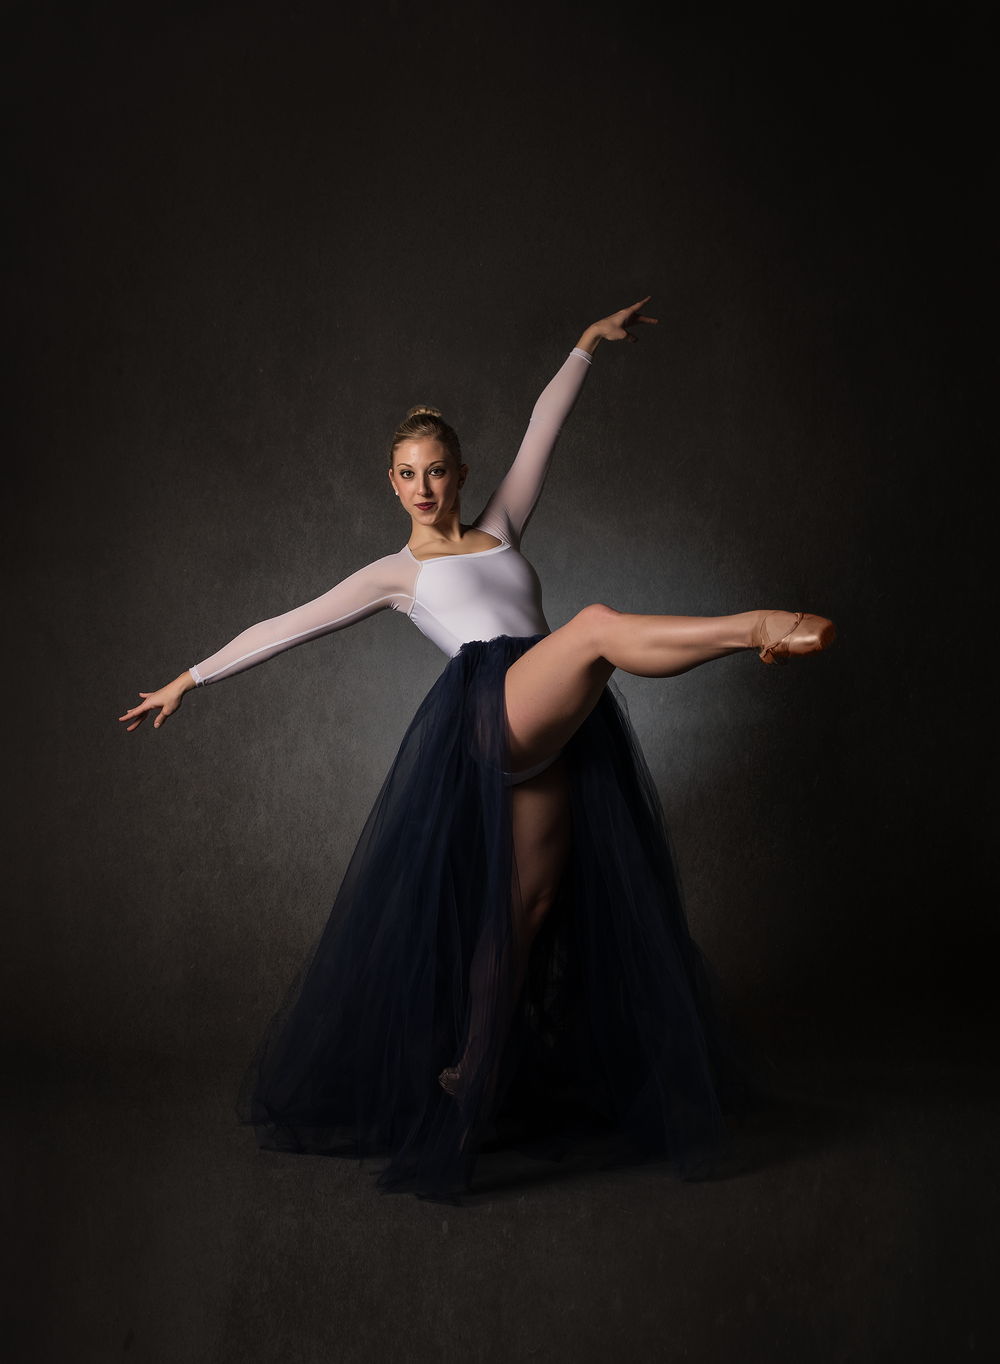 3677-Ballet-posing-shoot-Edit.png